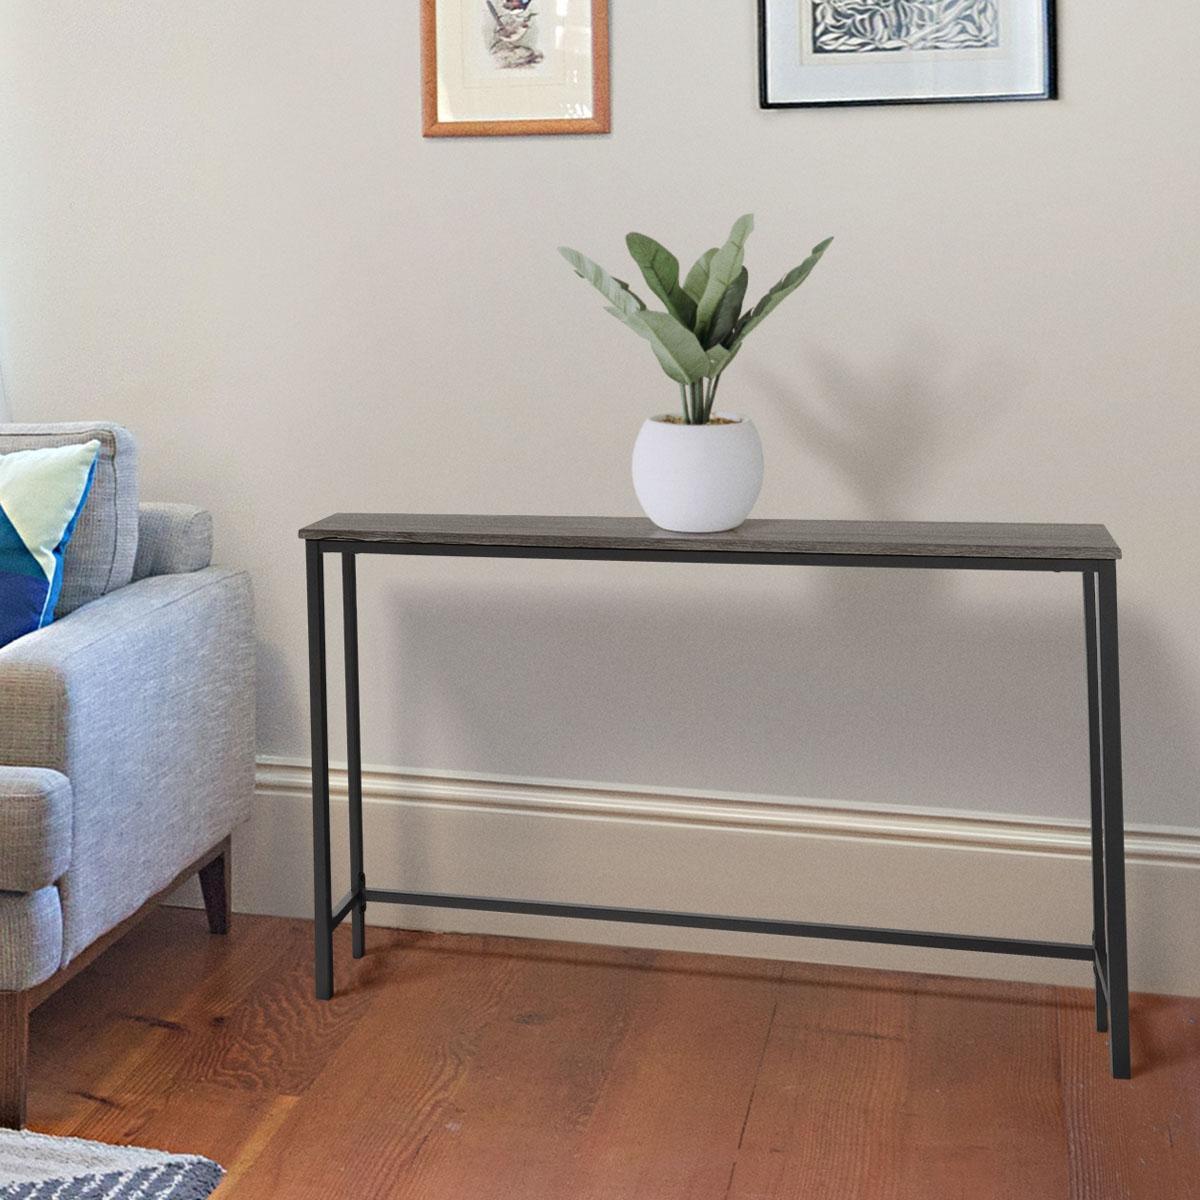 Zenvida Sofa Console Table For Hallway Entryway Living Room